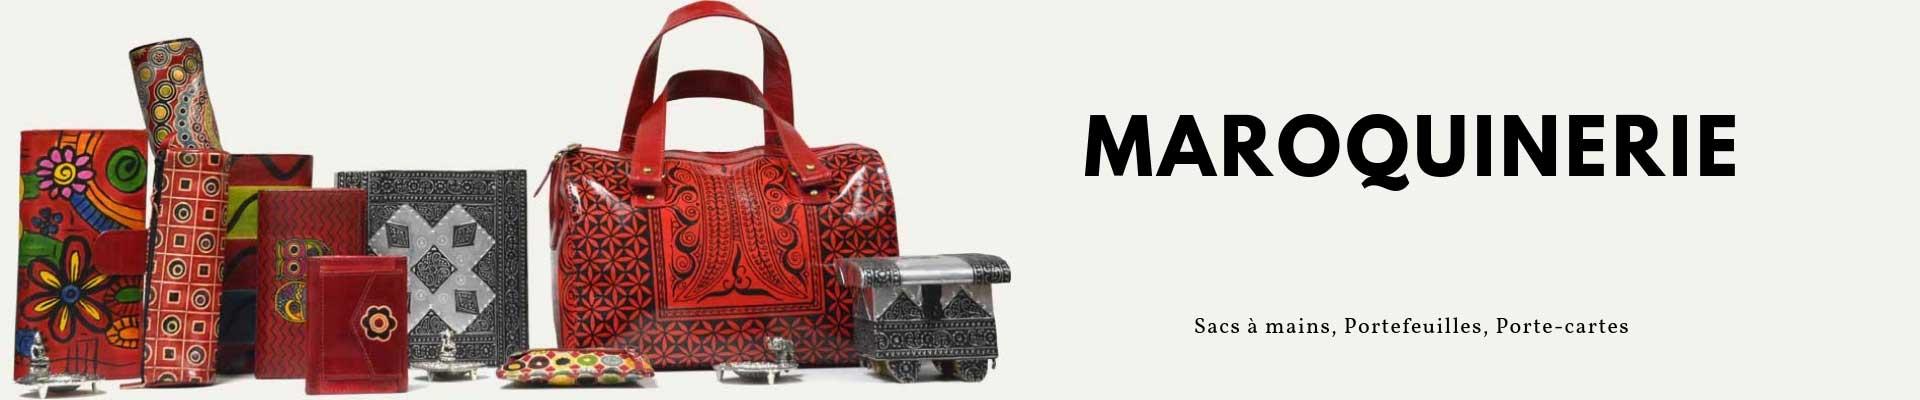 maroquinerie sac et portefeuille